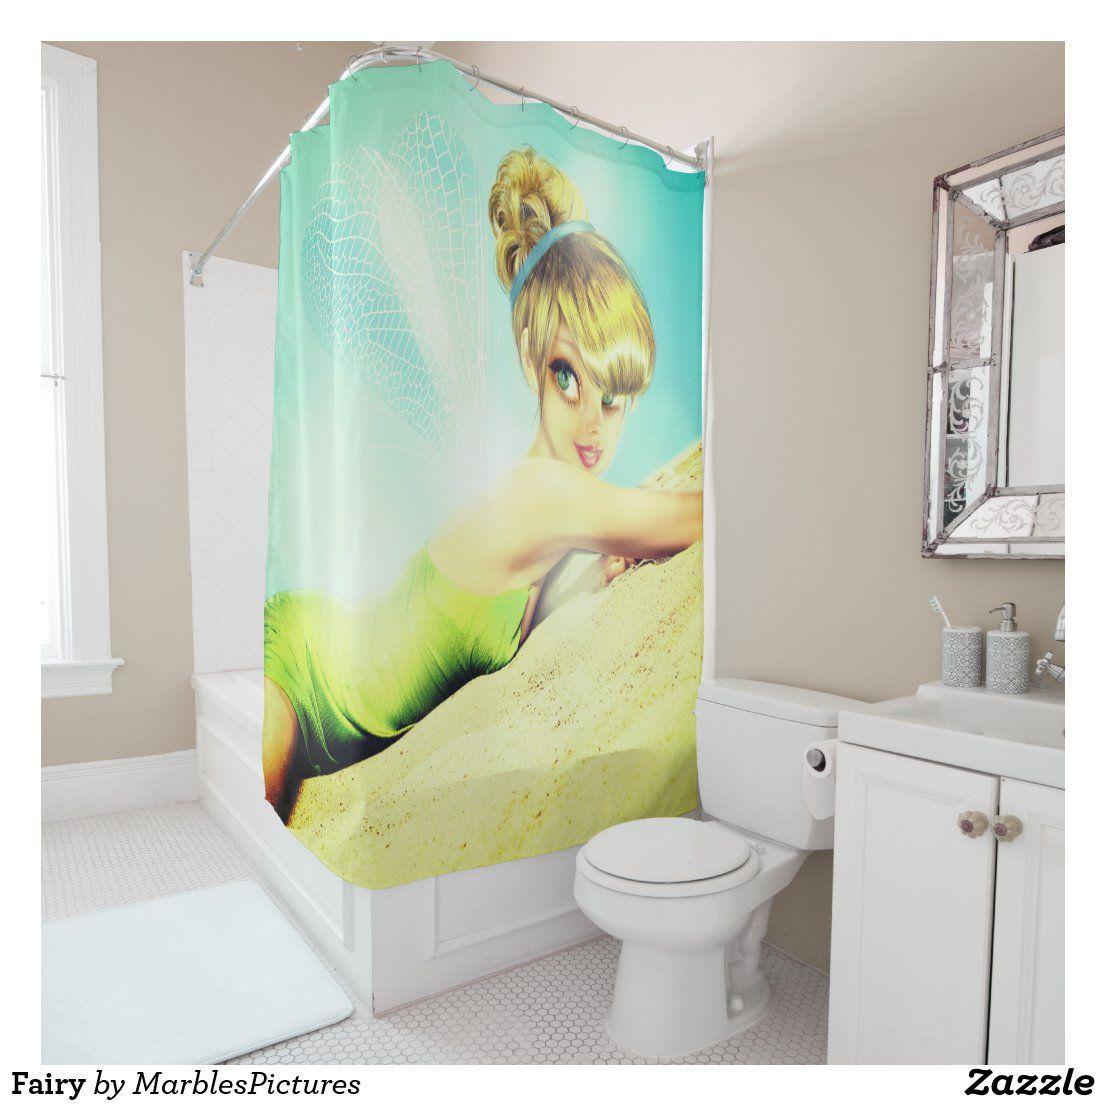 Fairy Shower Curtain Zazzle Com In 2020 Shower Curtain